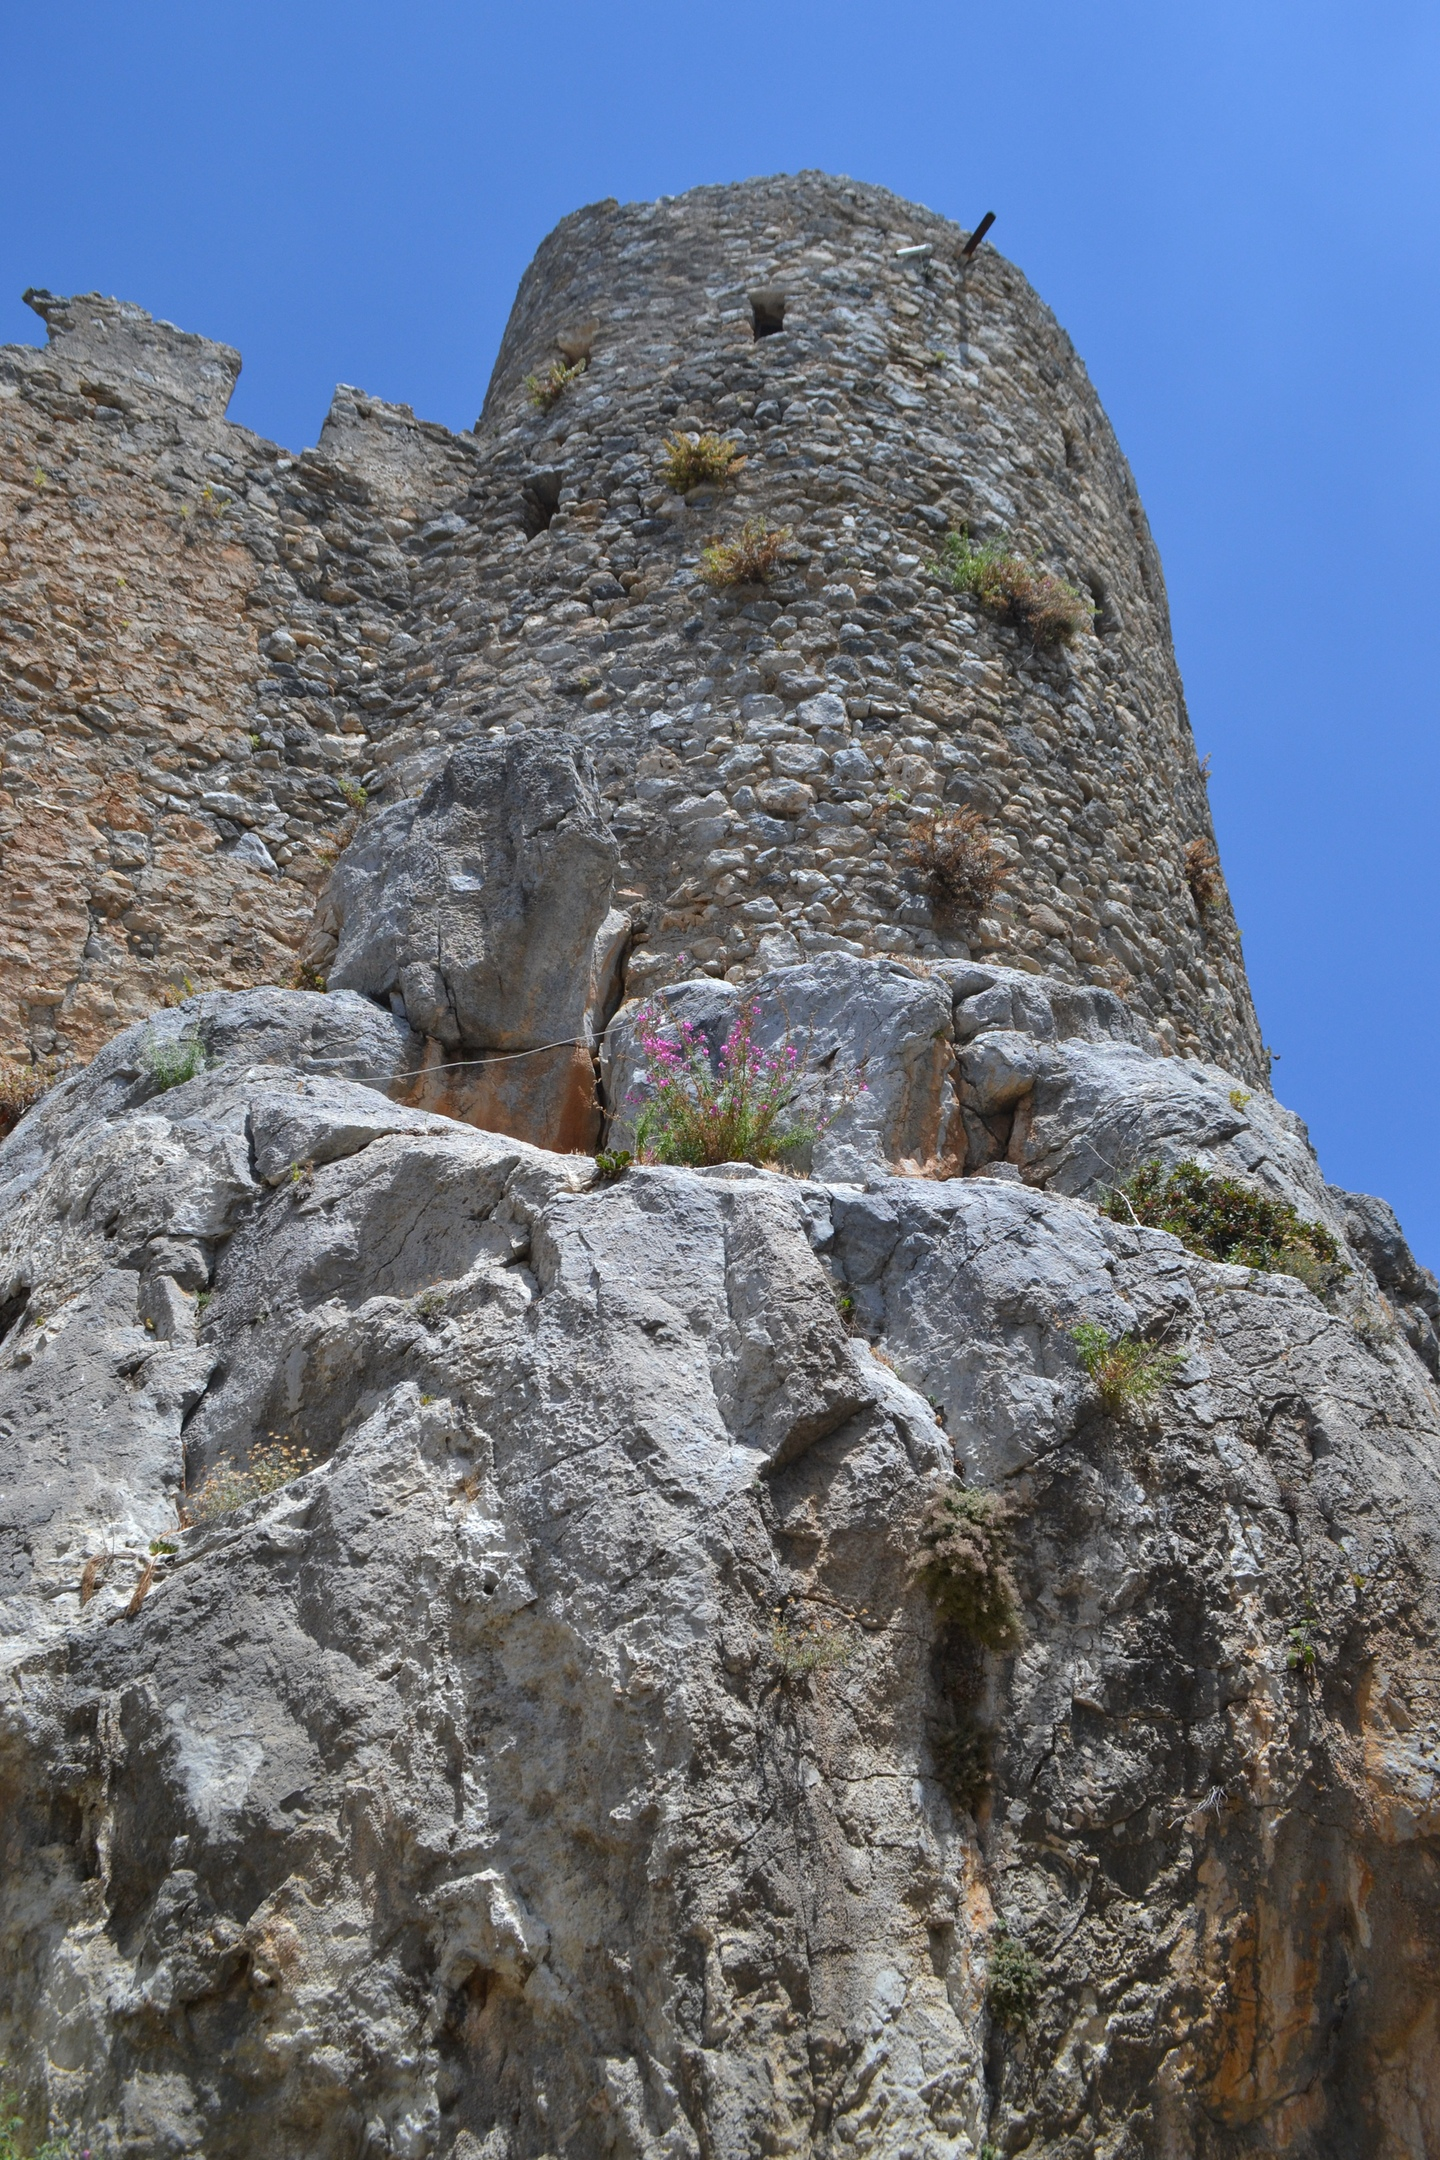 Северный Кипр. Замок Святого Иллариона. (фото). SXrlm7MG1cY